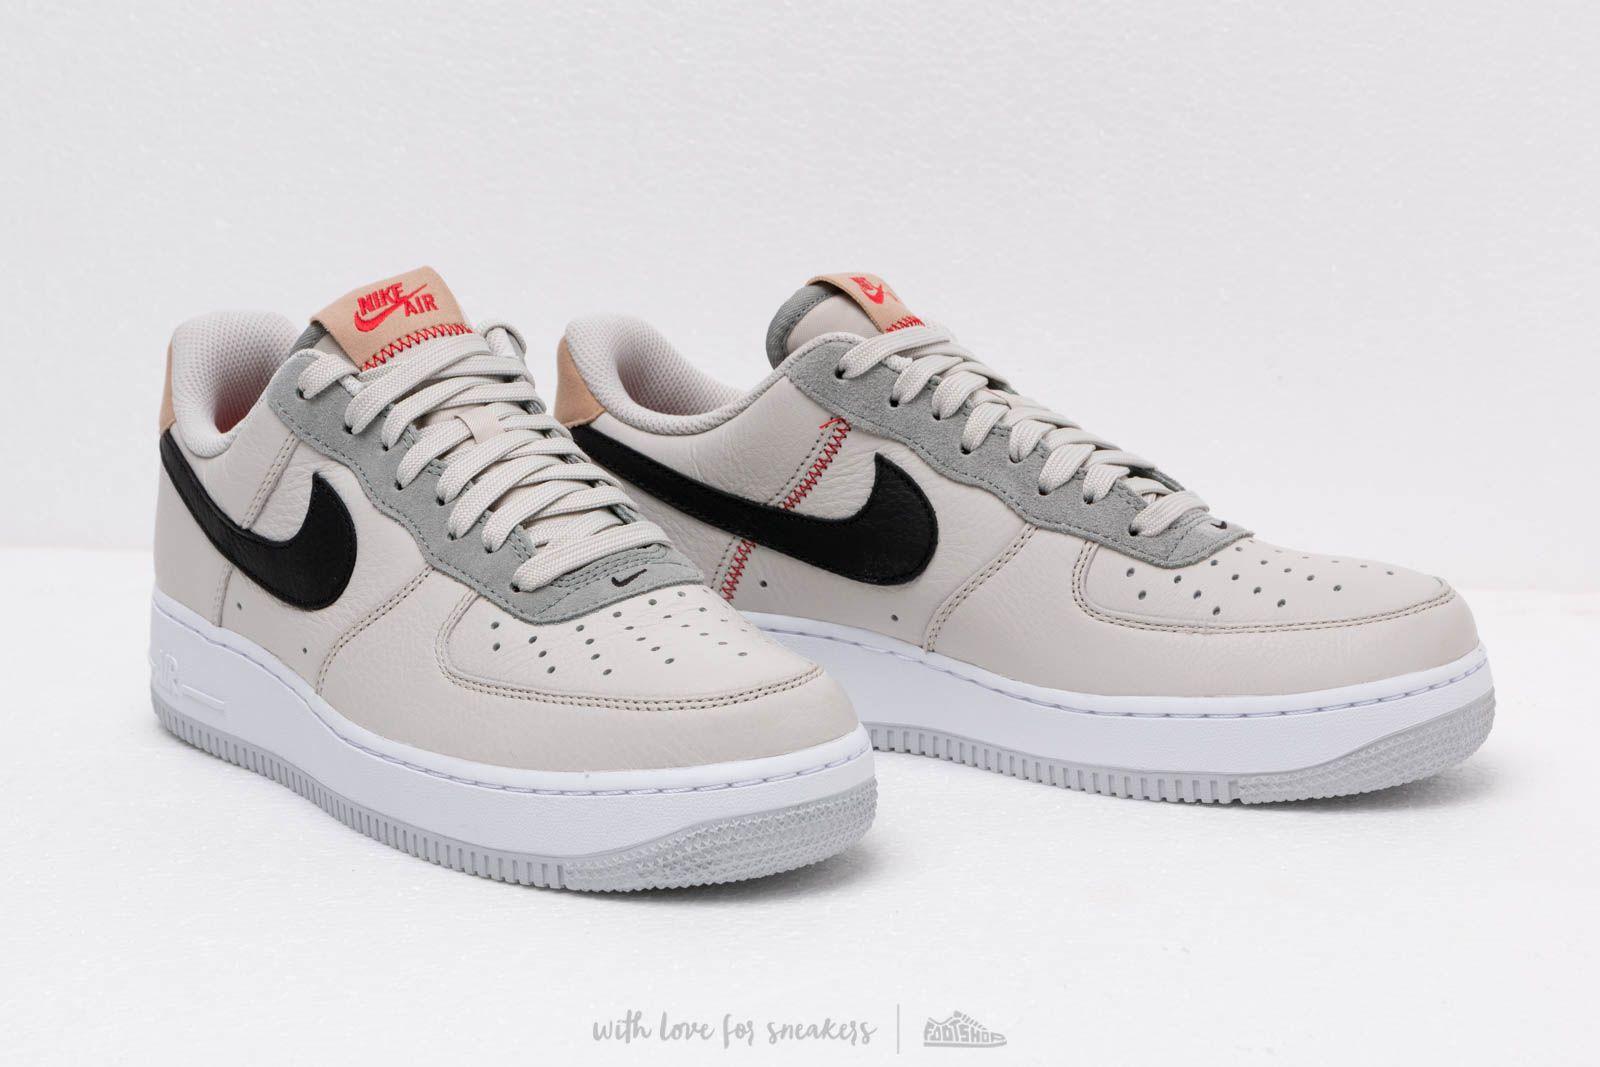 Nike Air Force 1 '07 Light Bone Black Mica Green | Footshop